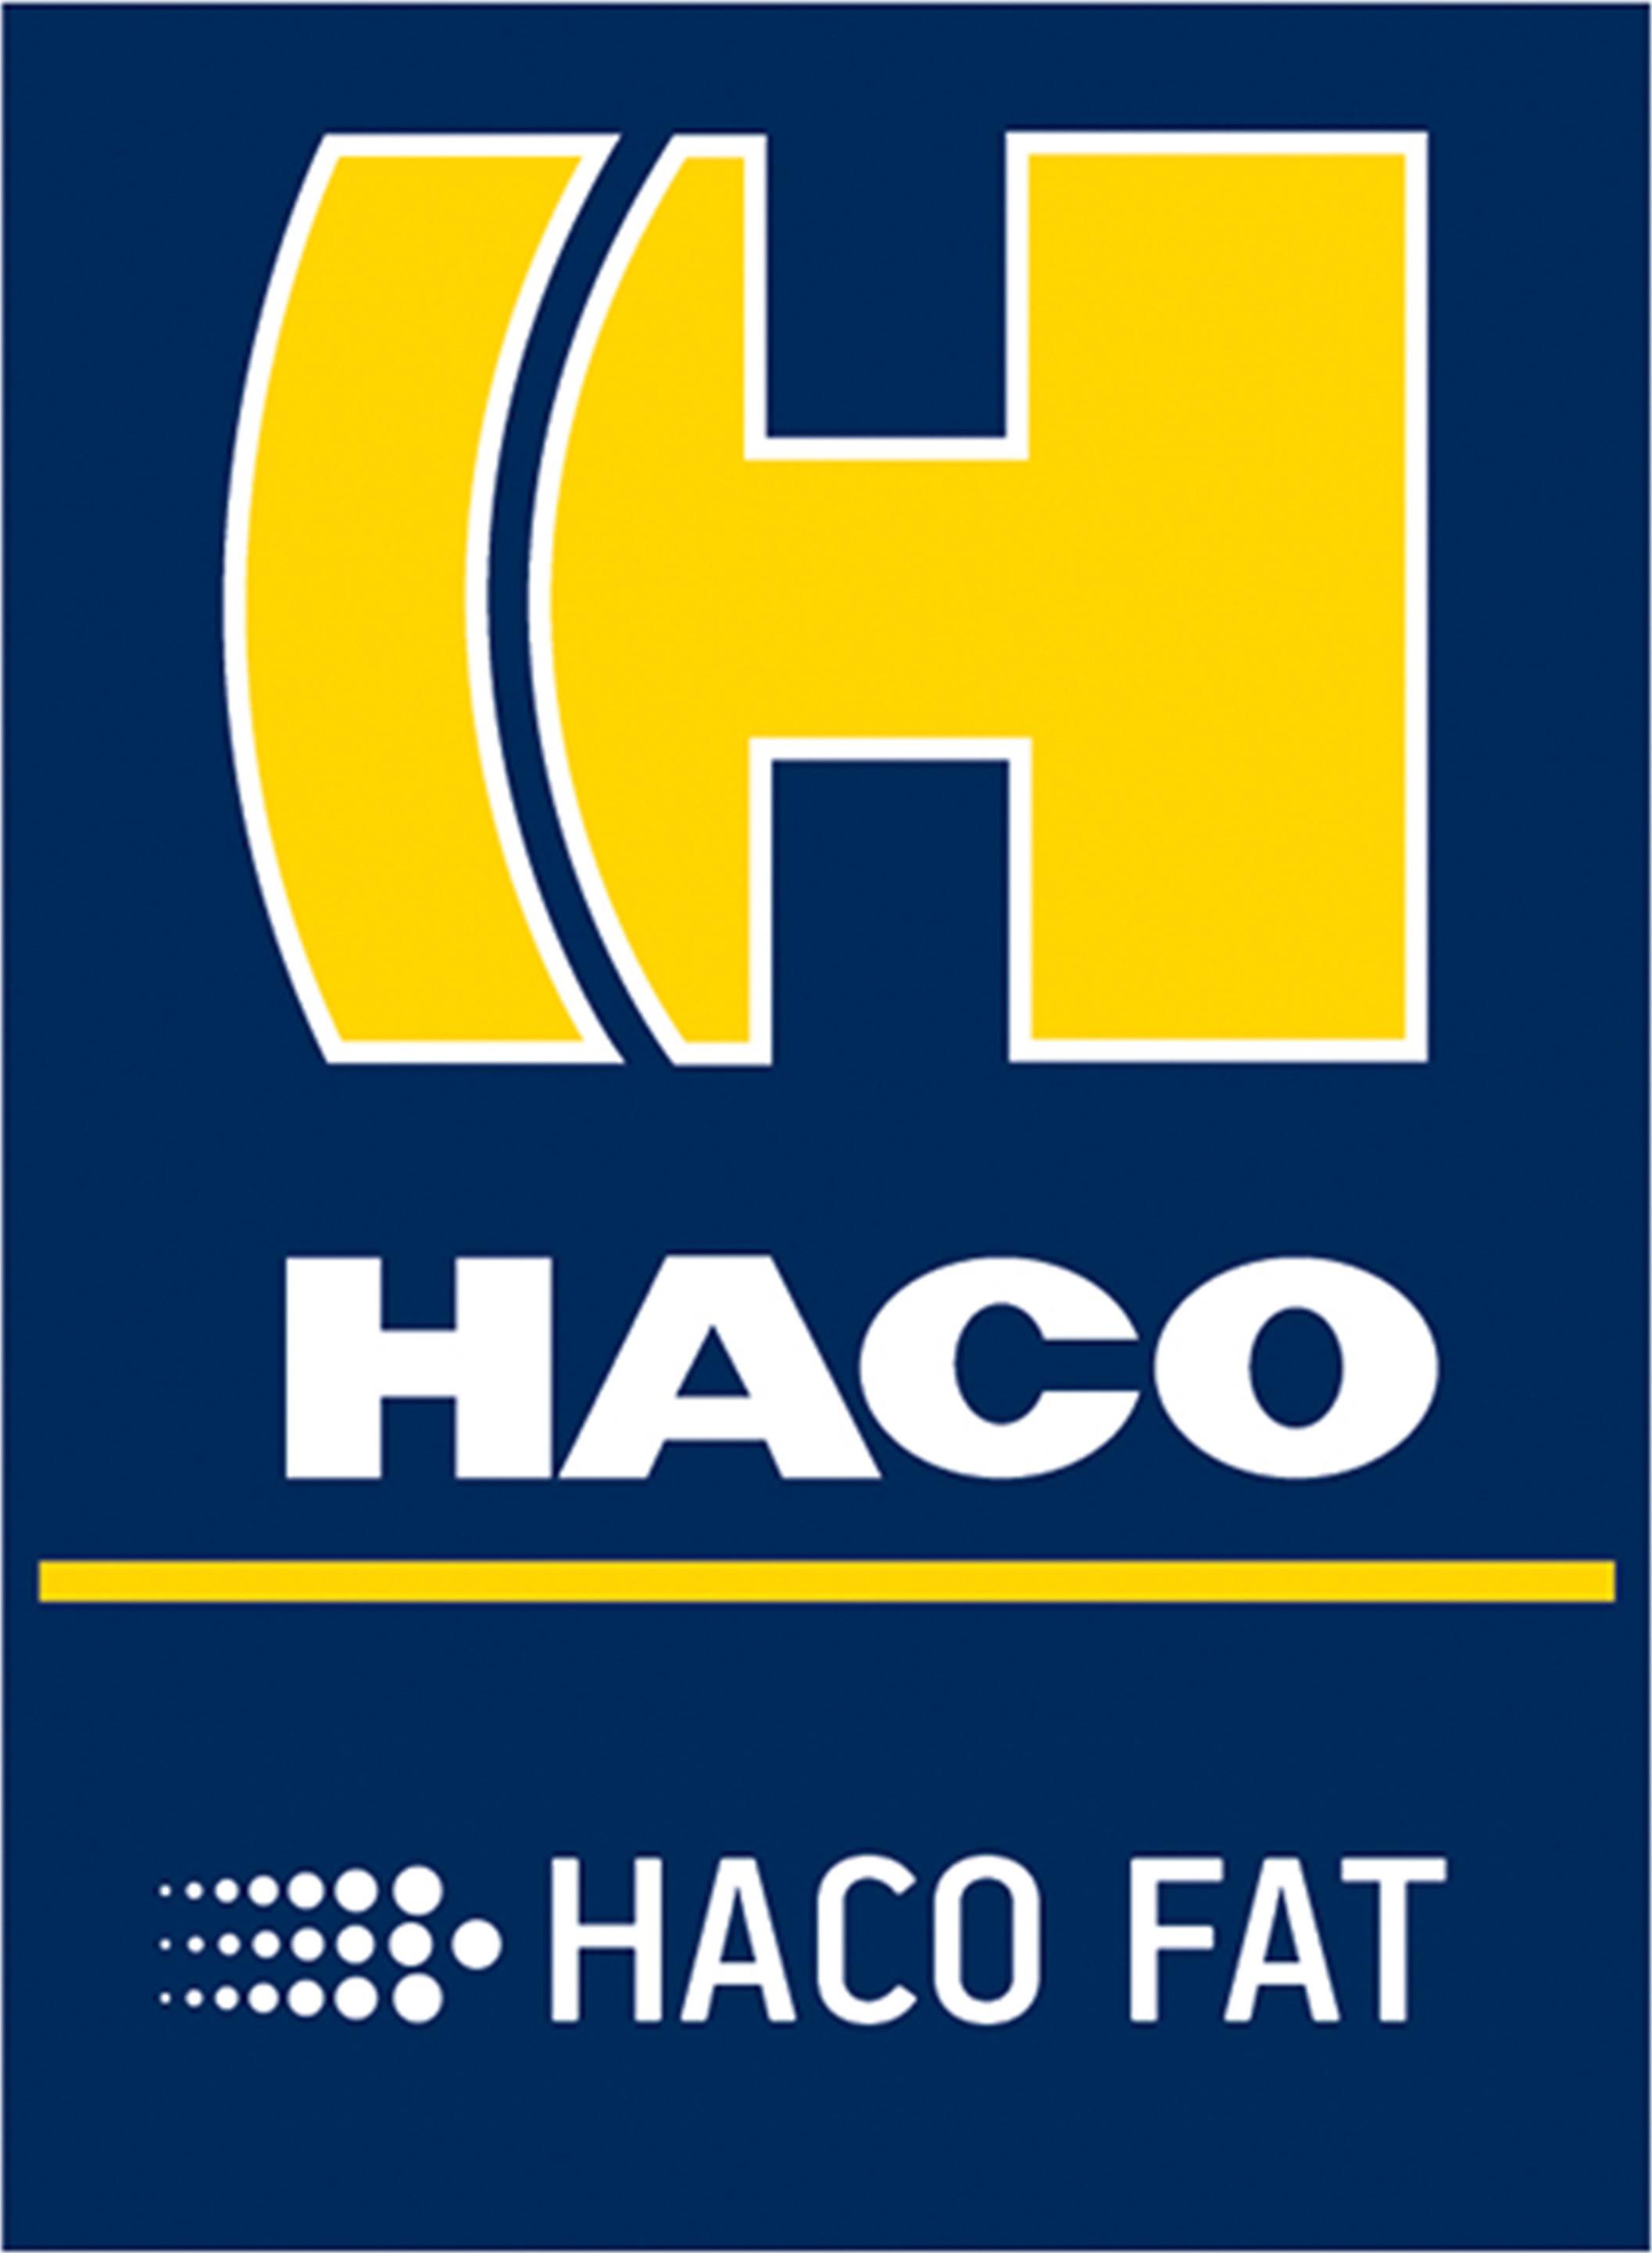 Haco Fat Sp. z o.o.